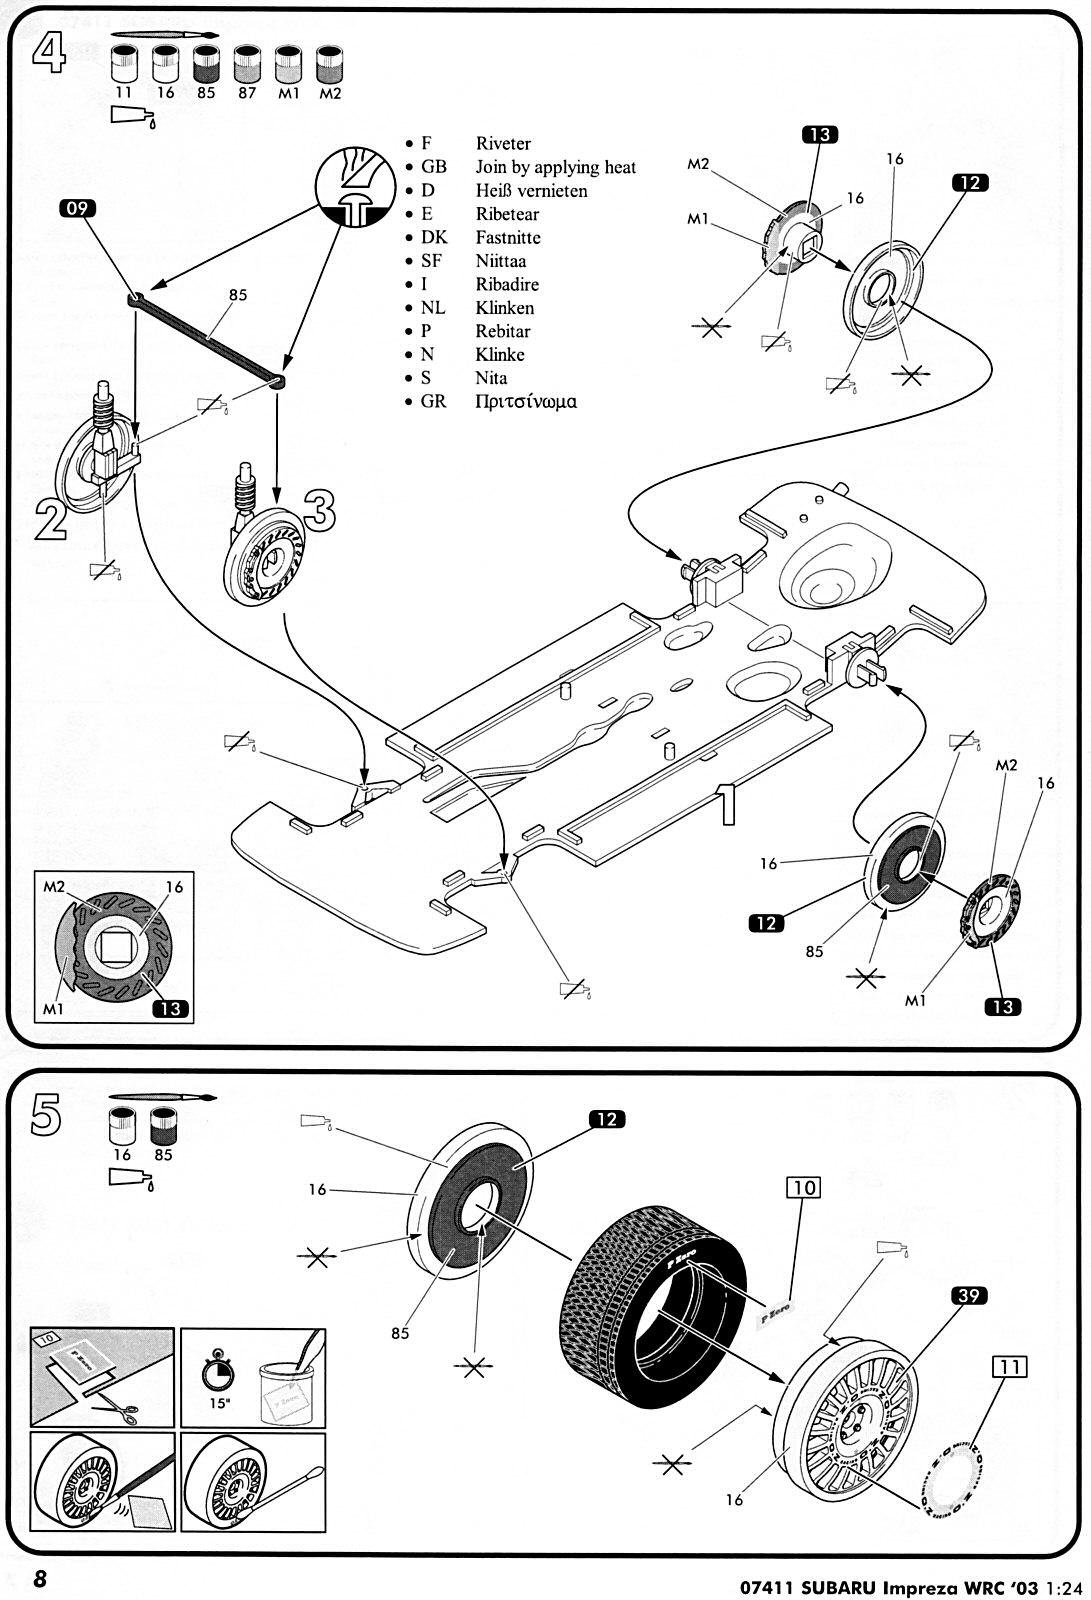 Subaru Impreza Forum | Wiring Diagram Database